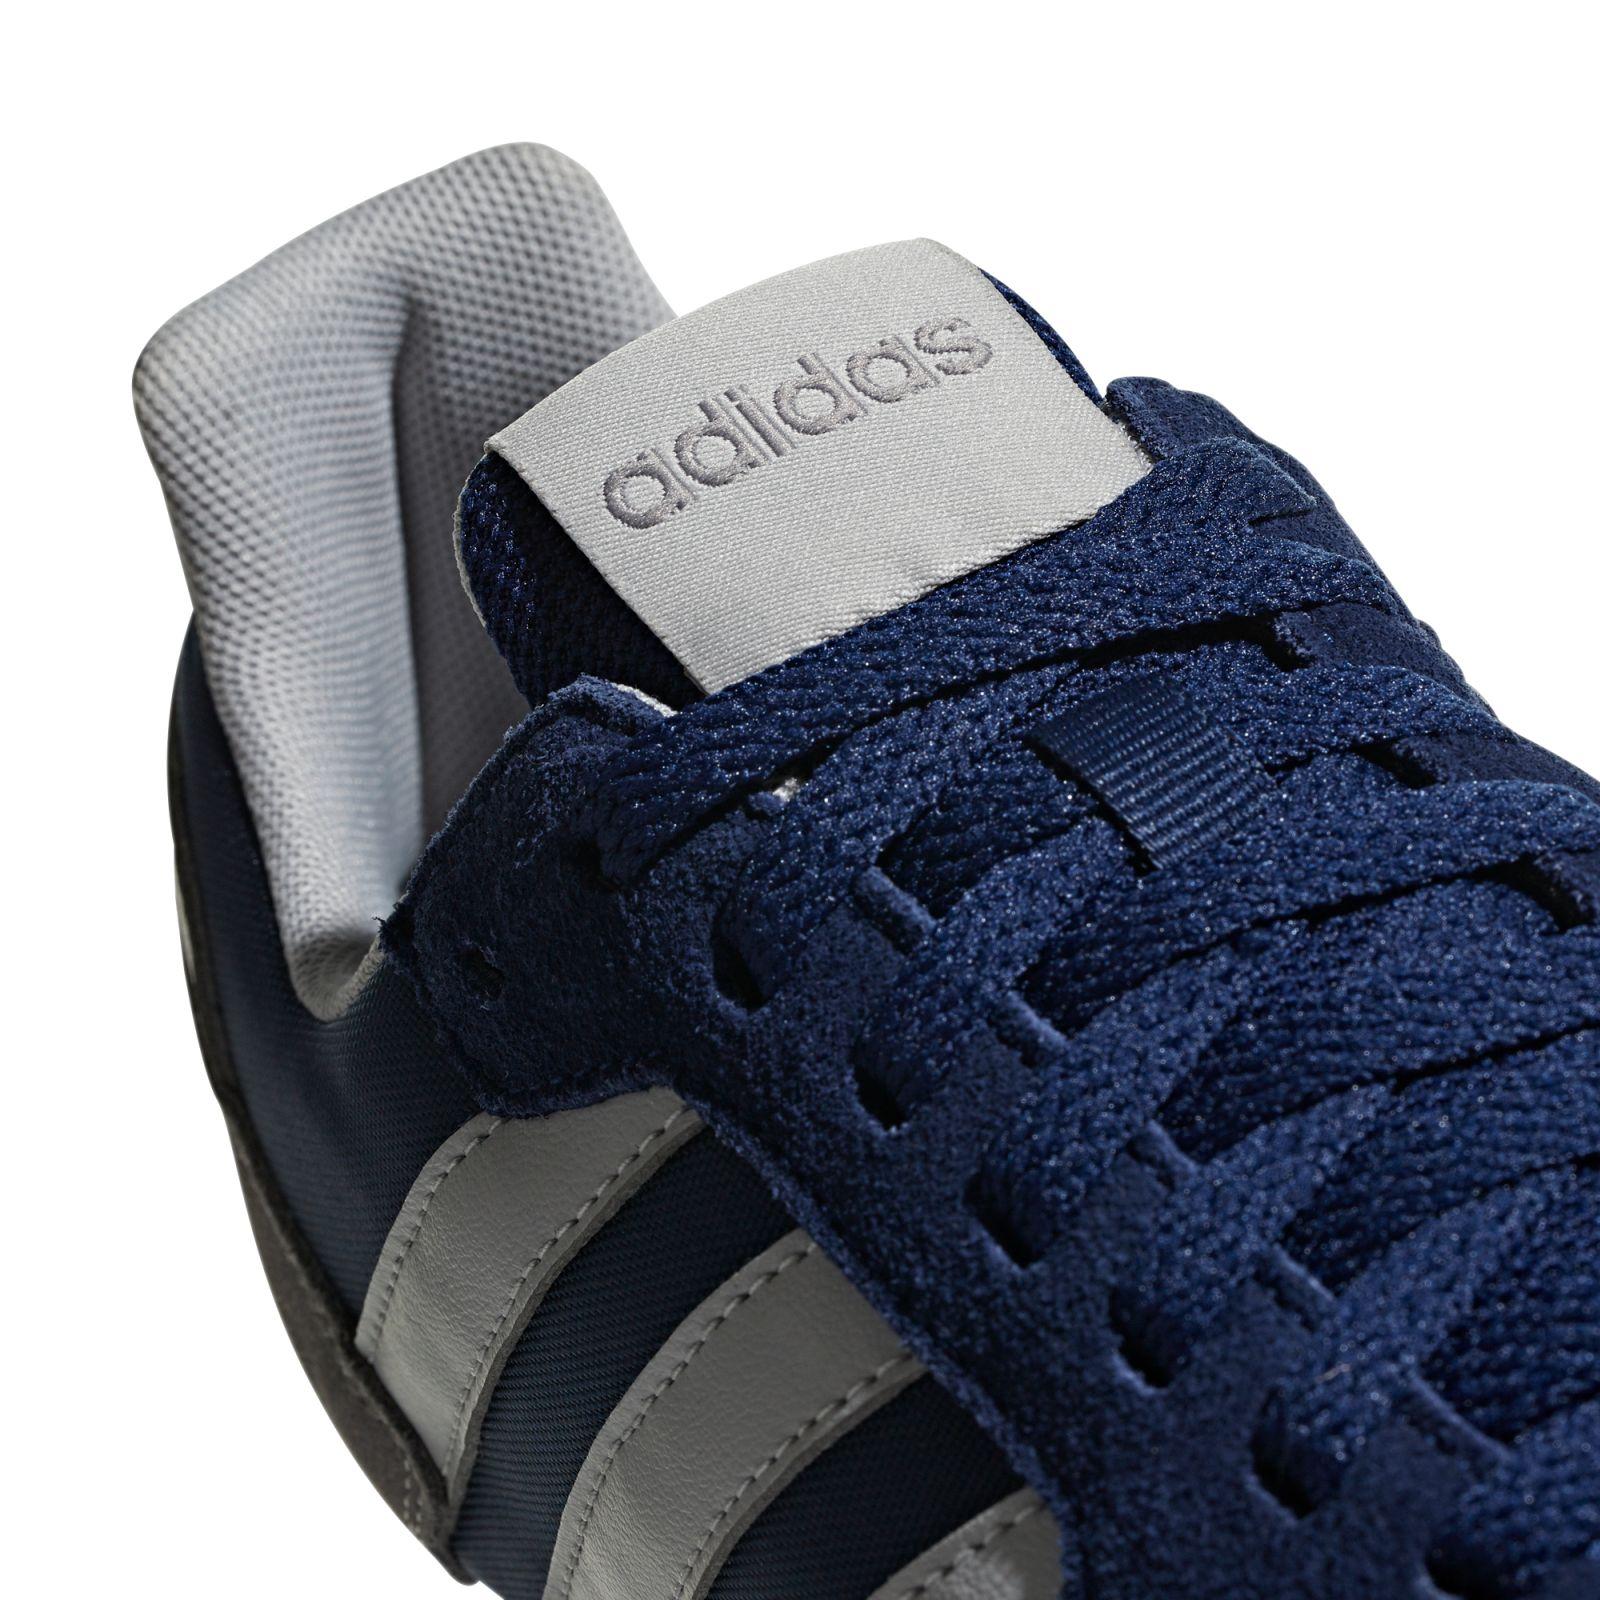 Details about Adidas Core Men's Freizeit Sport Fitness Schuhe Sneaker 8K Blue Blue